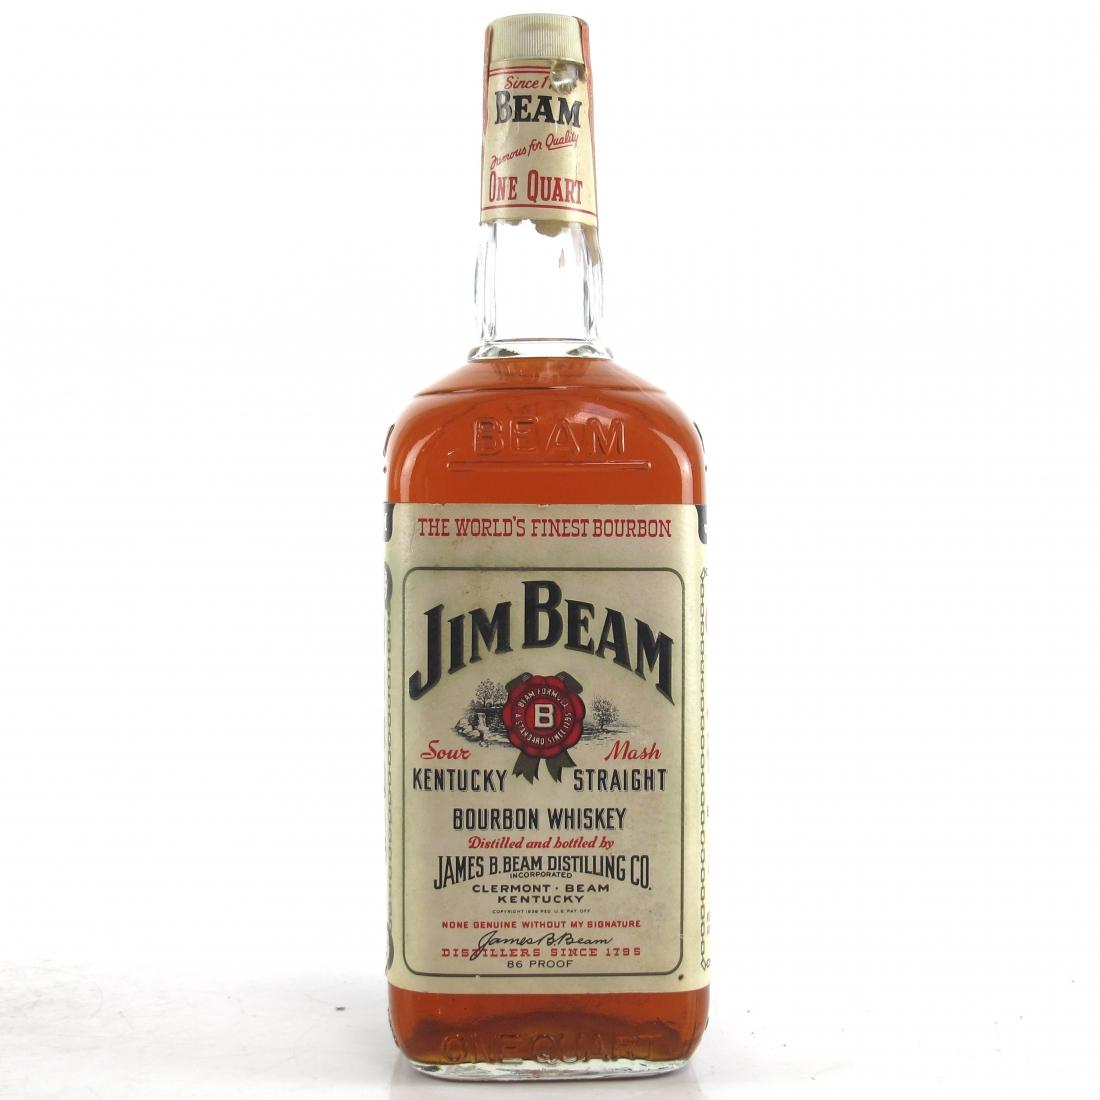 Jim Beam Kentucky Straight Bourbon 1 US Quart 1970s